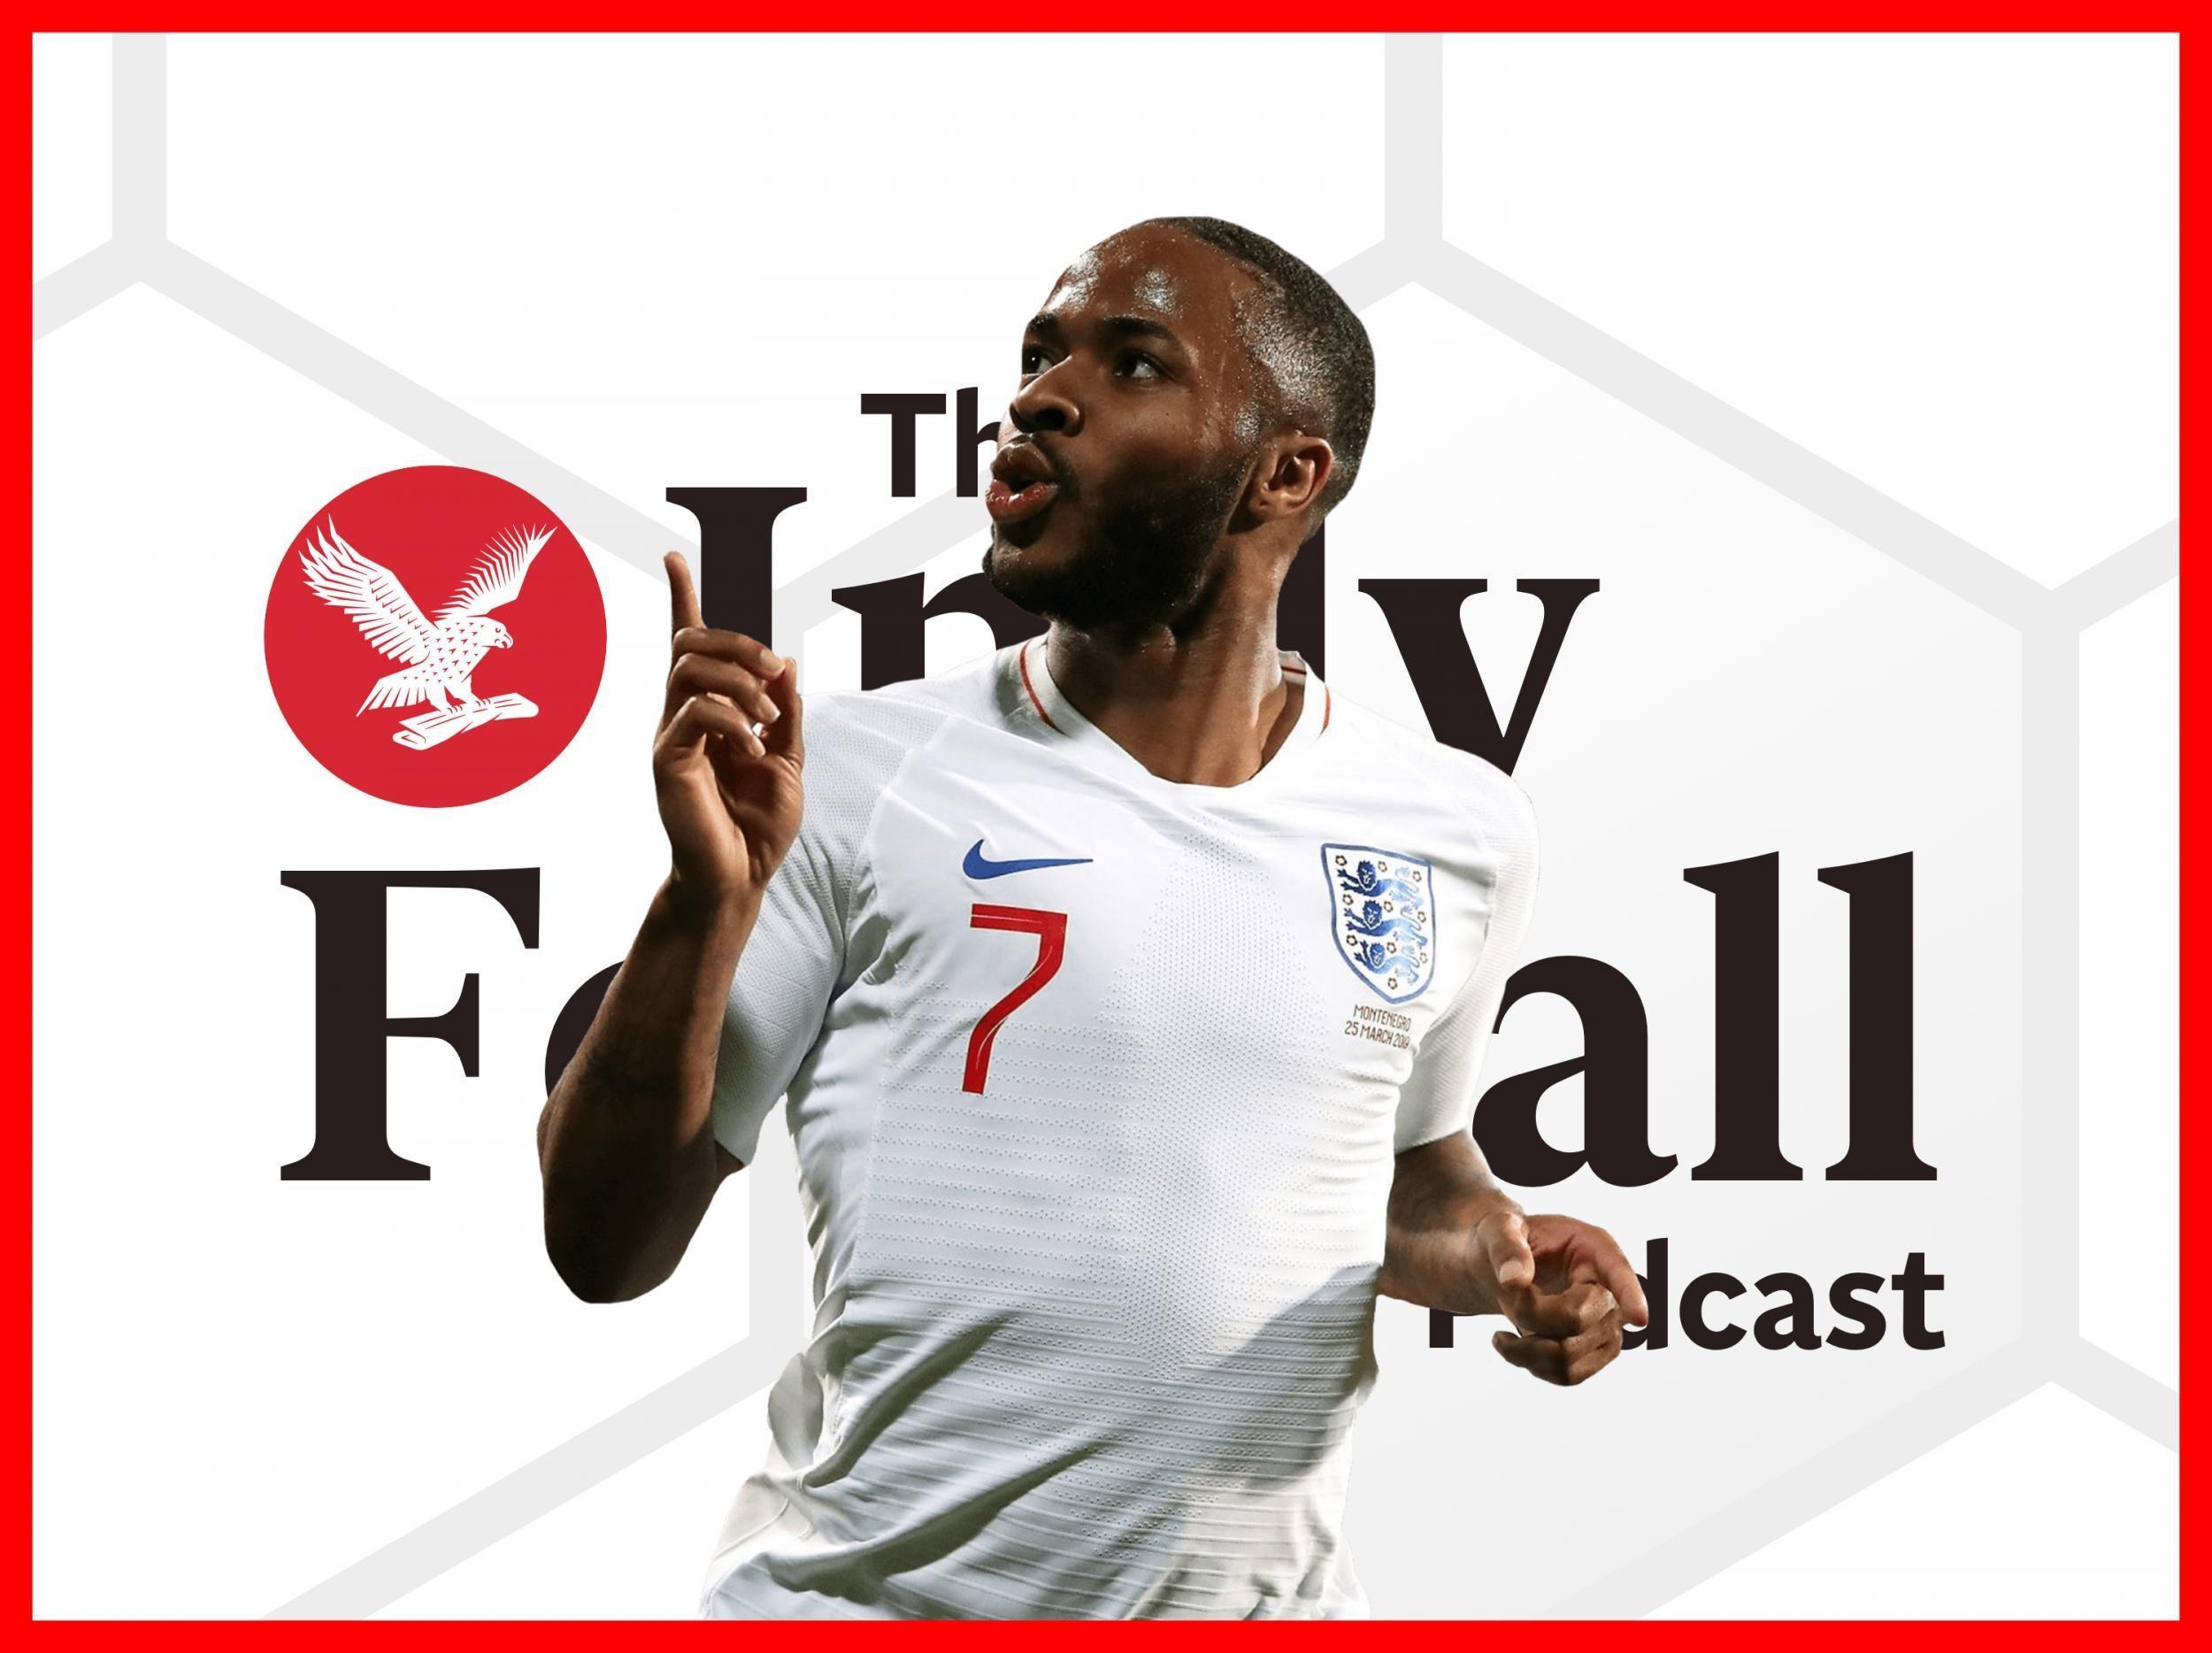 Indy Football Podcast: England, Gareth Southgate and reacting to Raheem Sterling vs Joe Gomez